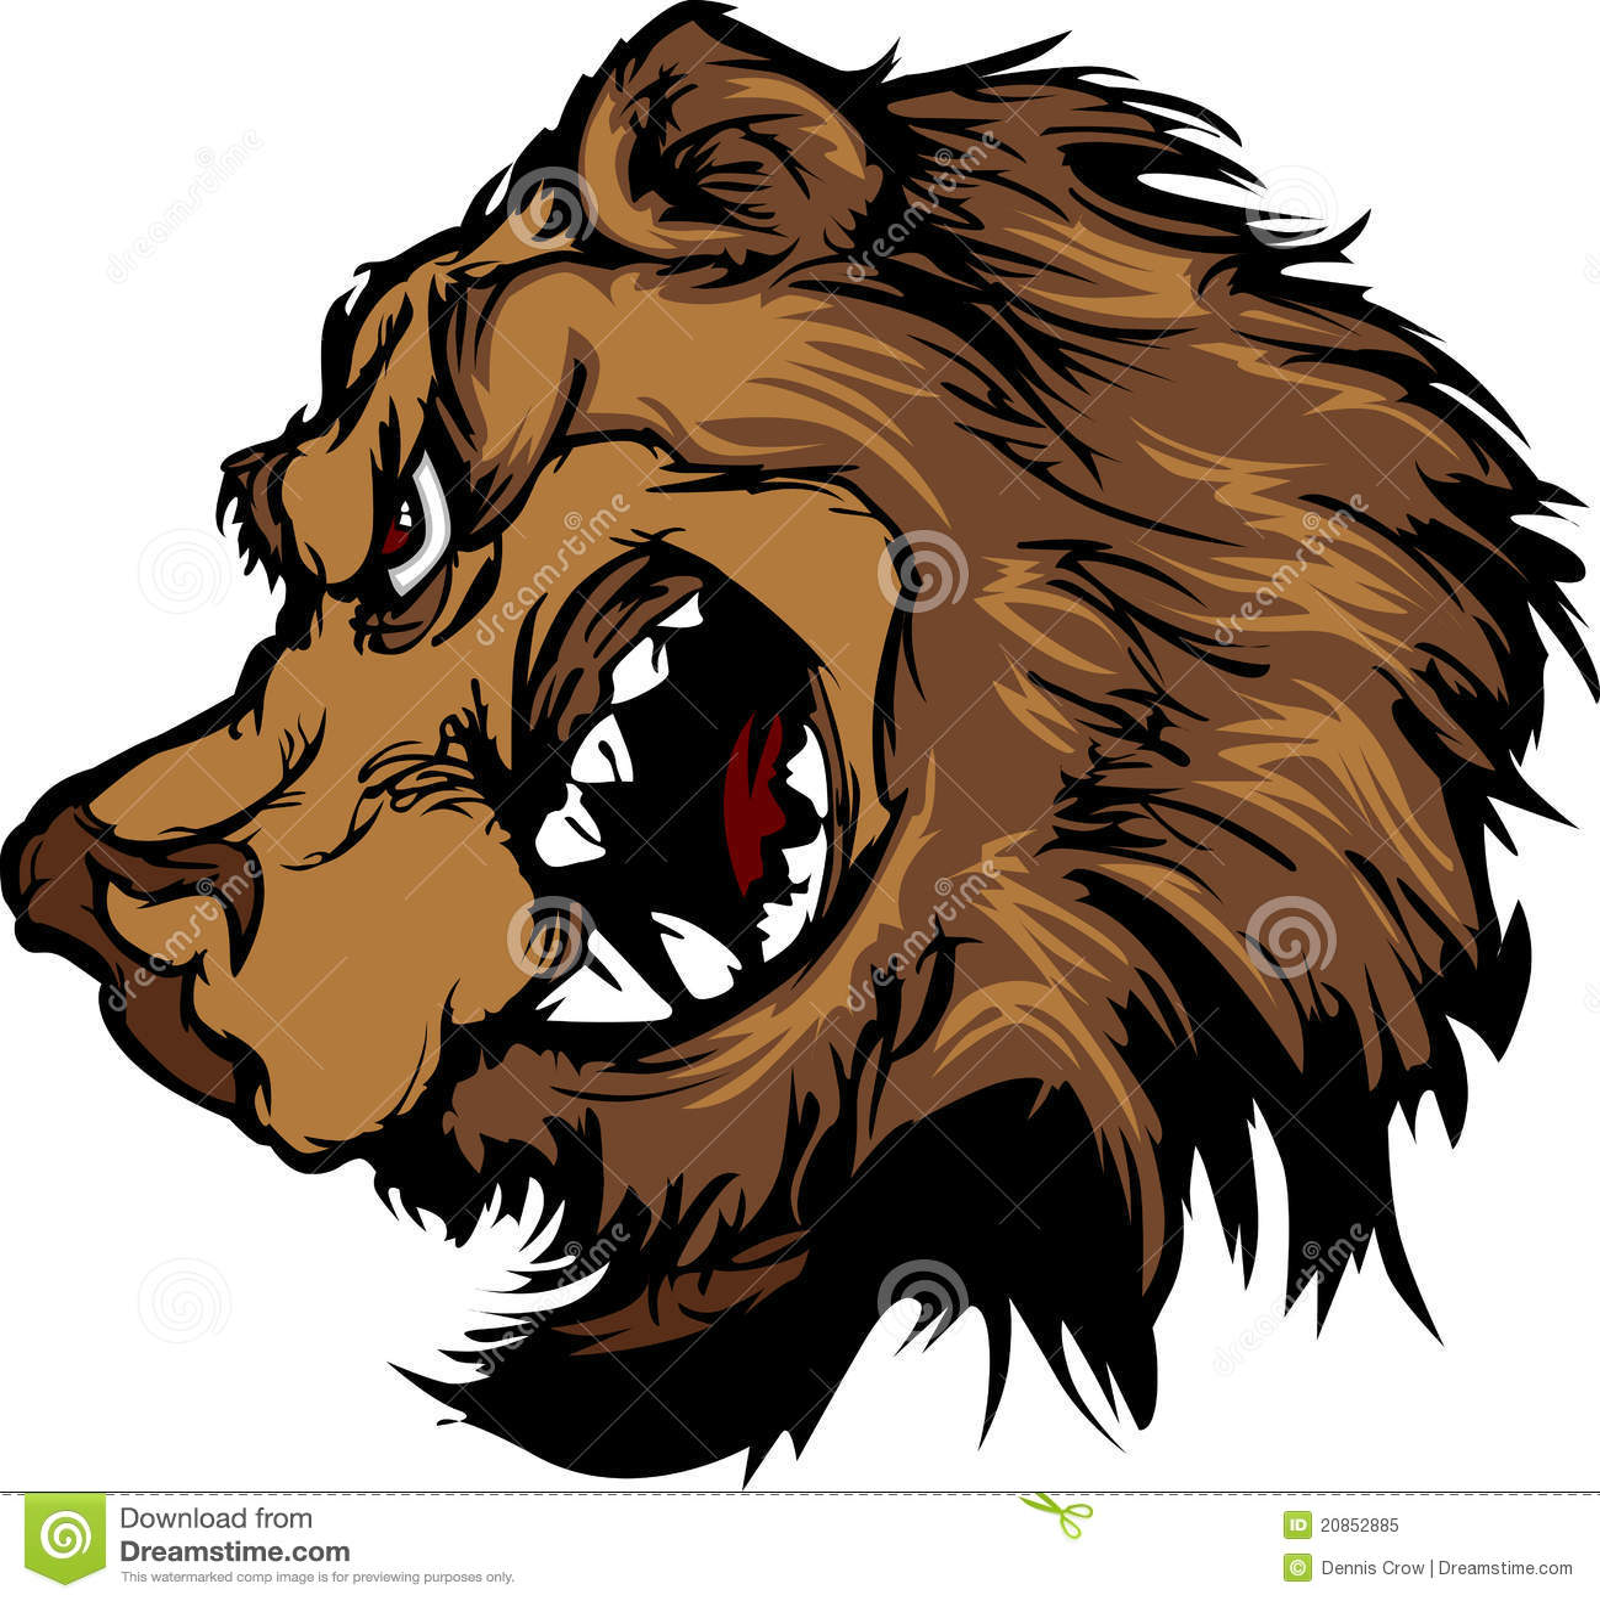 Angry bear head drawing - photo#26